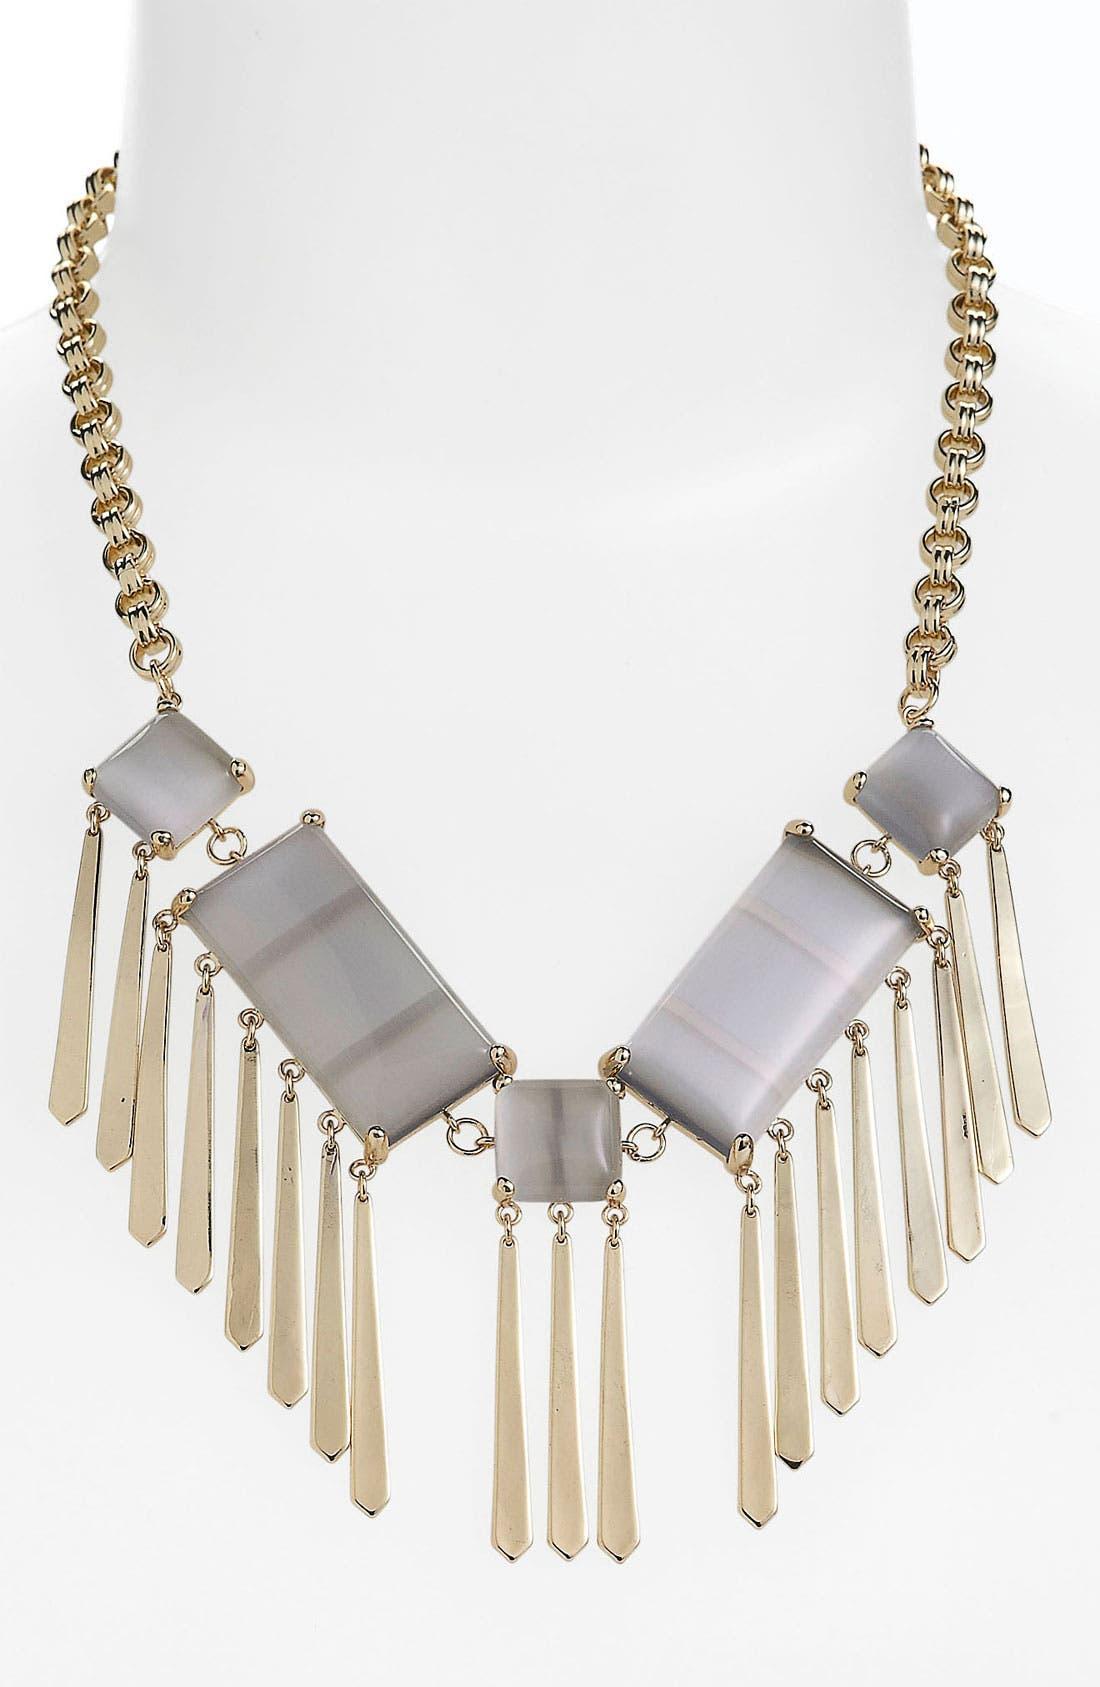 Main Image - Kendra Scott 'Leandra' Bib Necklace